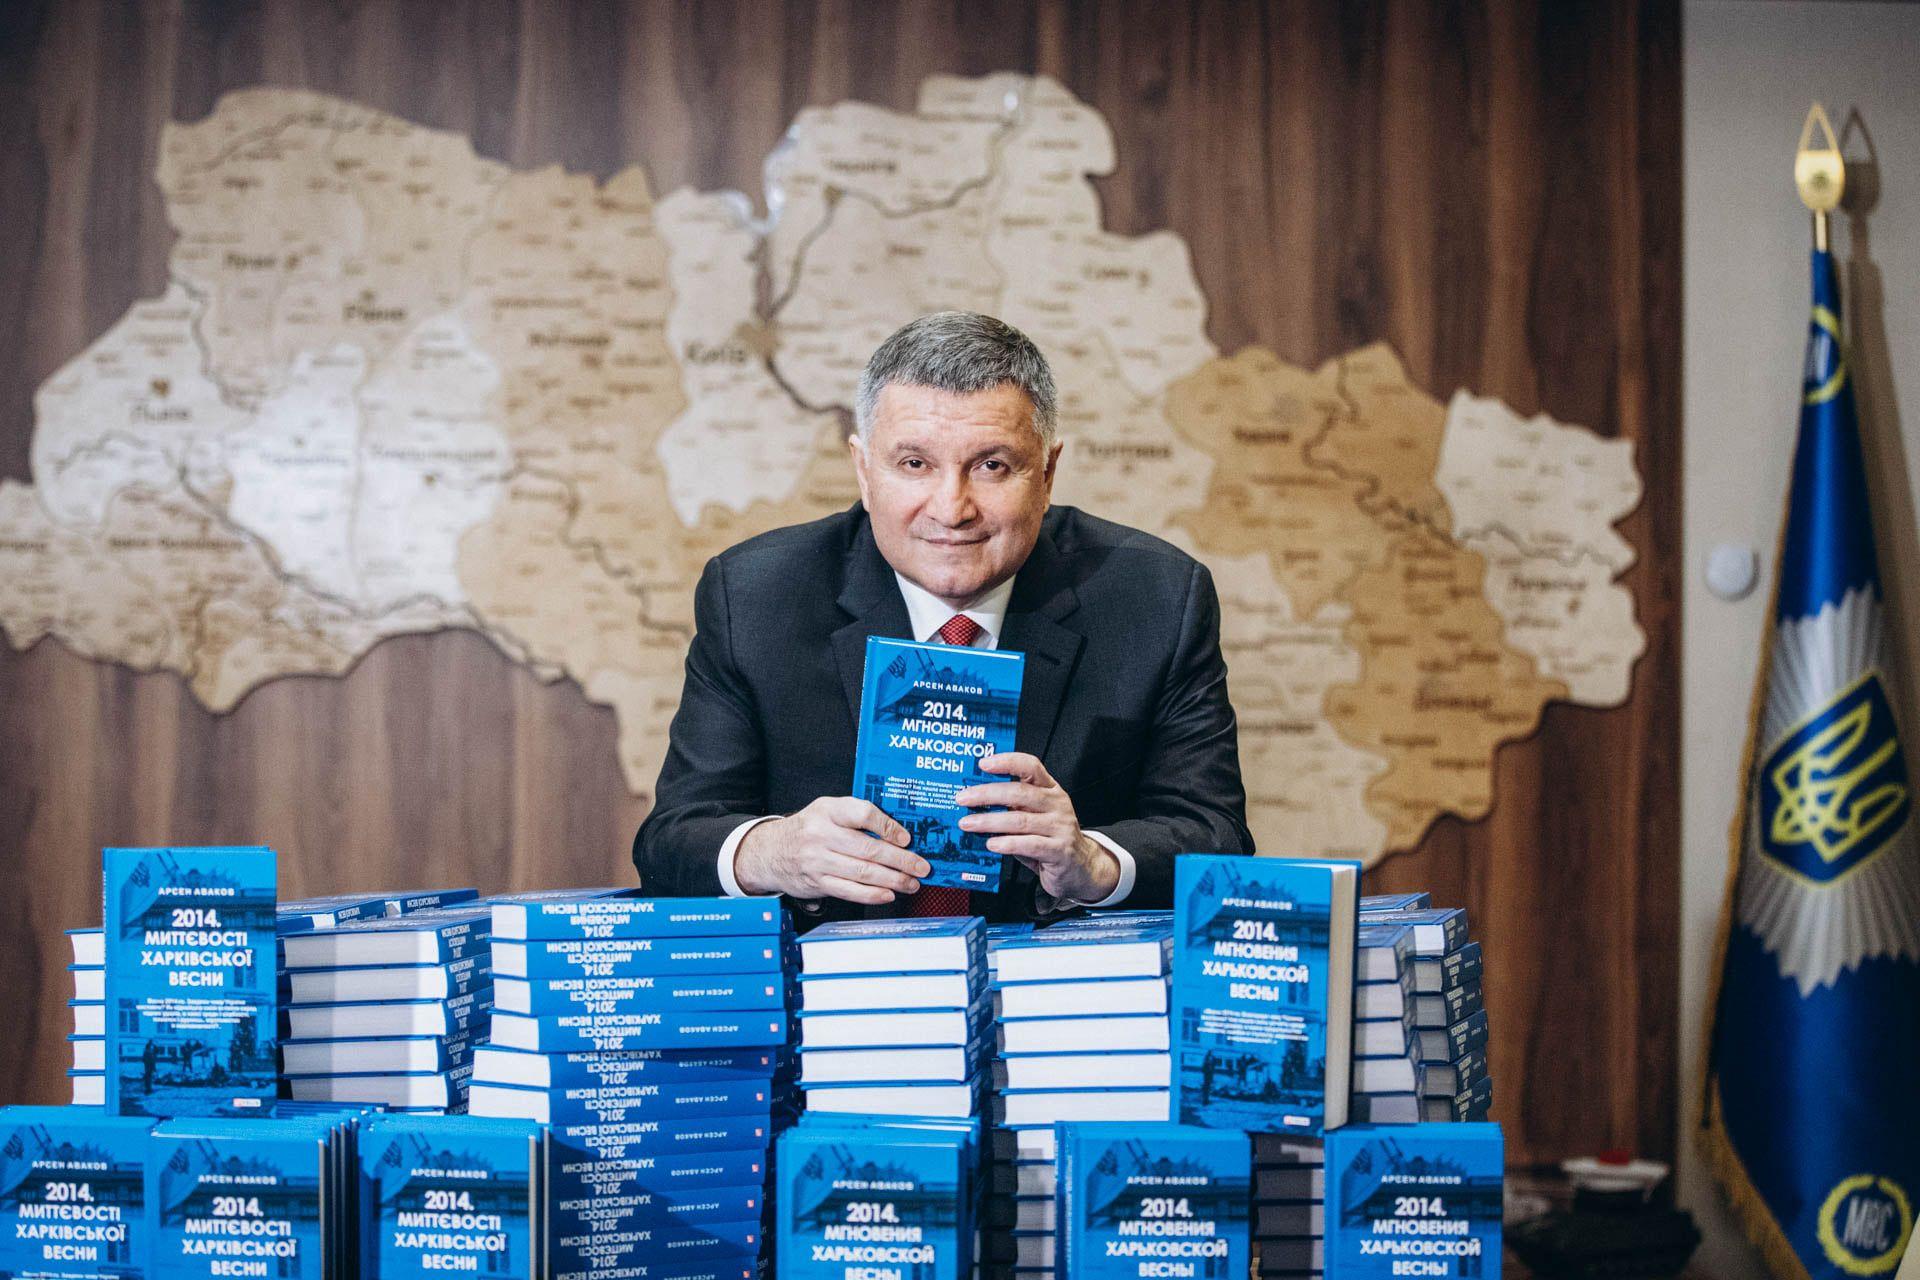 Голова МВС Аваков написав книжку «слобожанською» мовою (ФОТО)